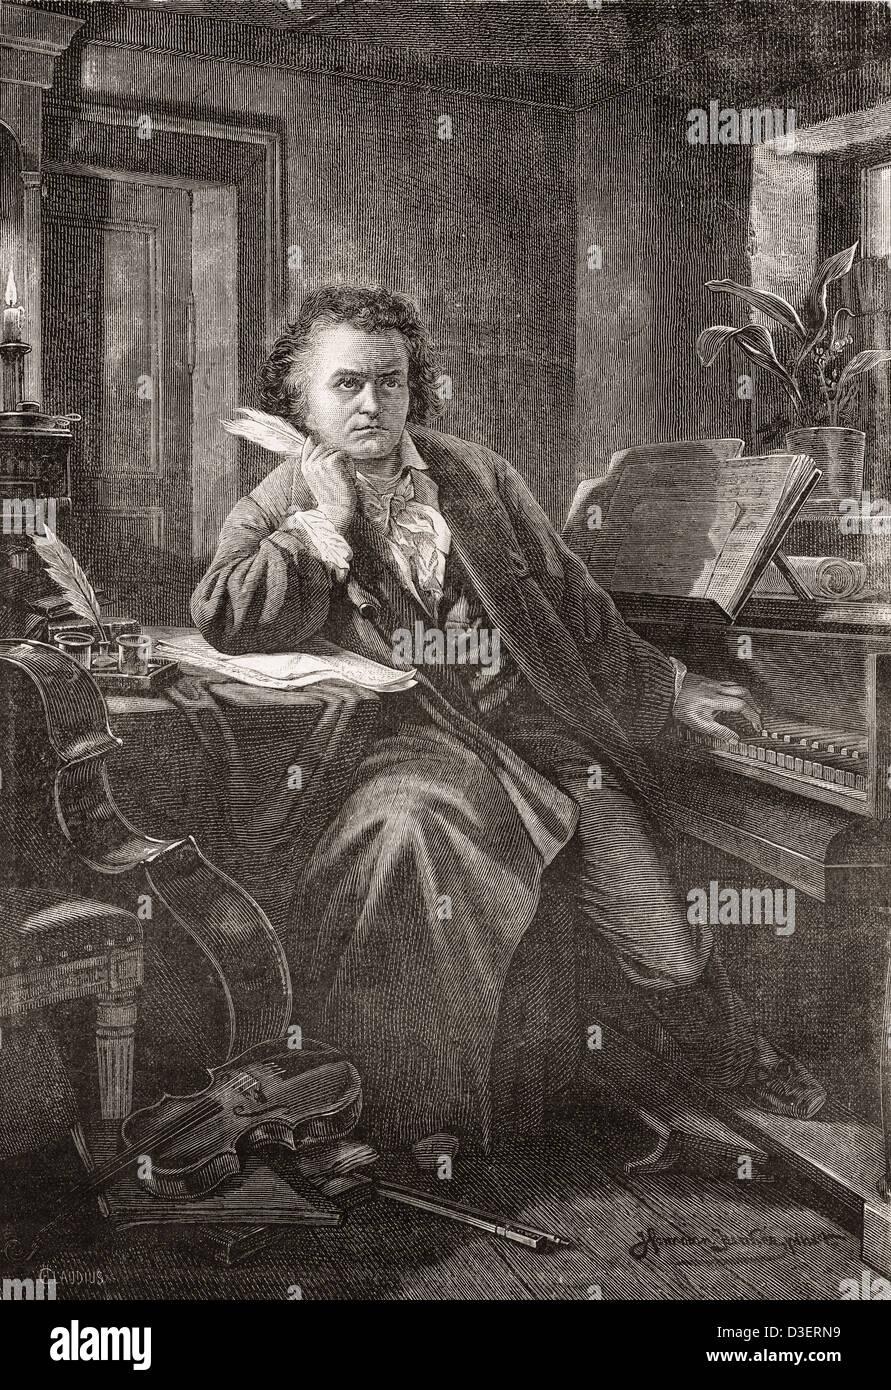 Ludwig van Beethoven, 1770 - 1827. German composer and pianist. - Stock Image